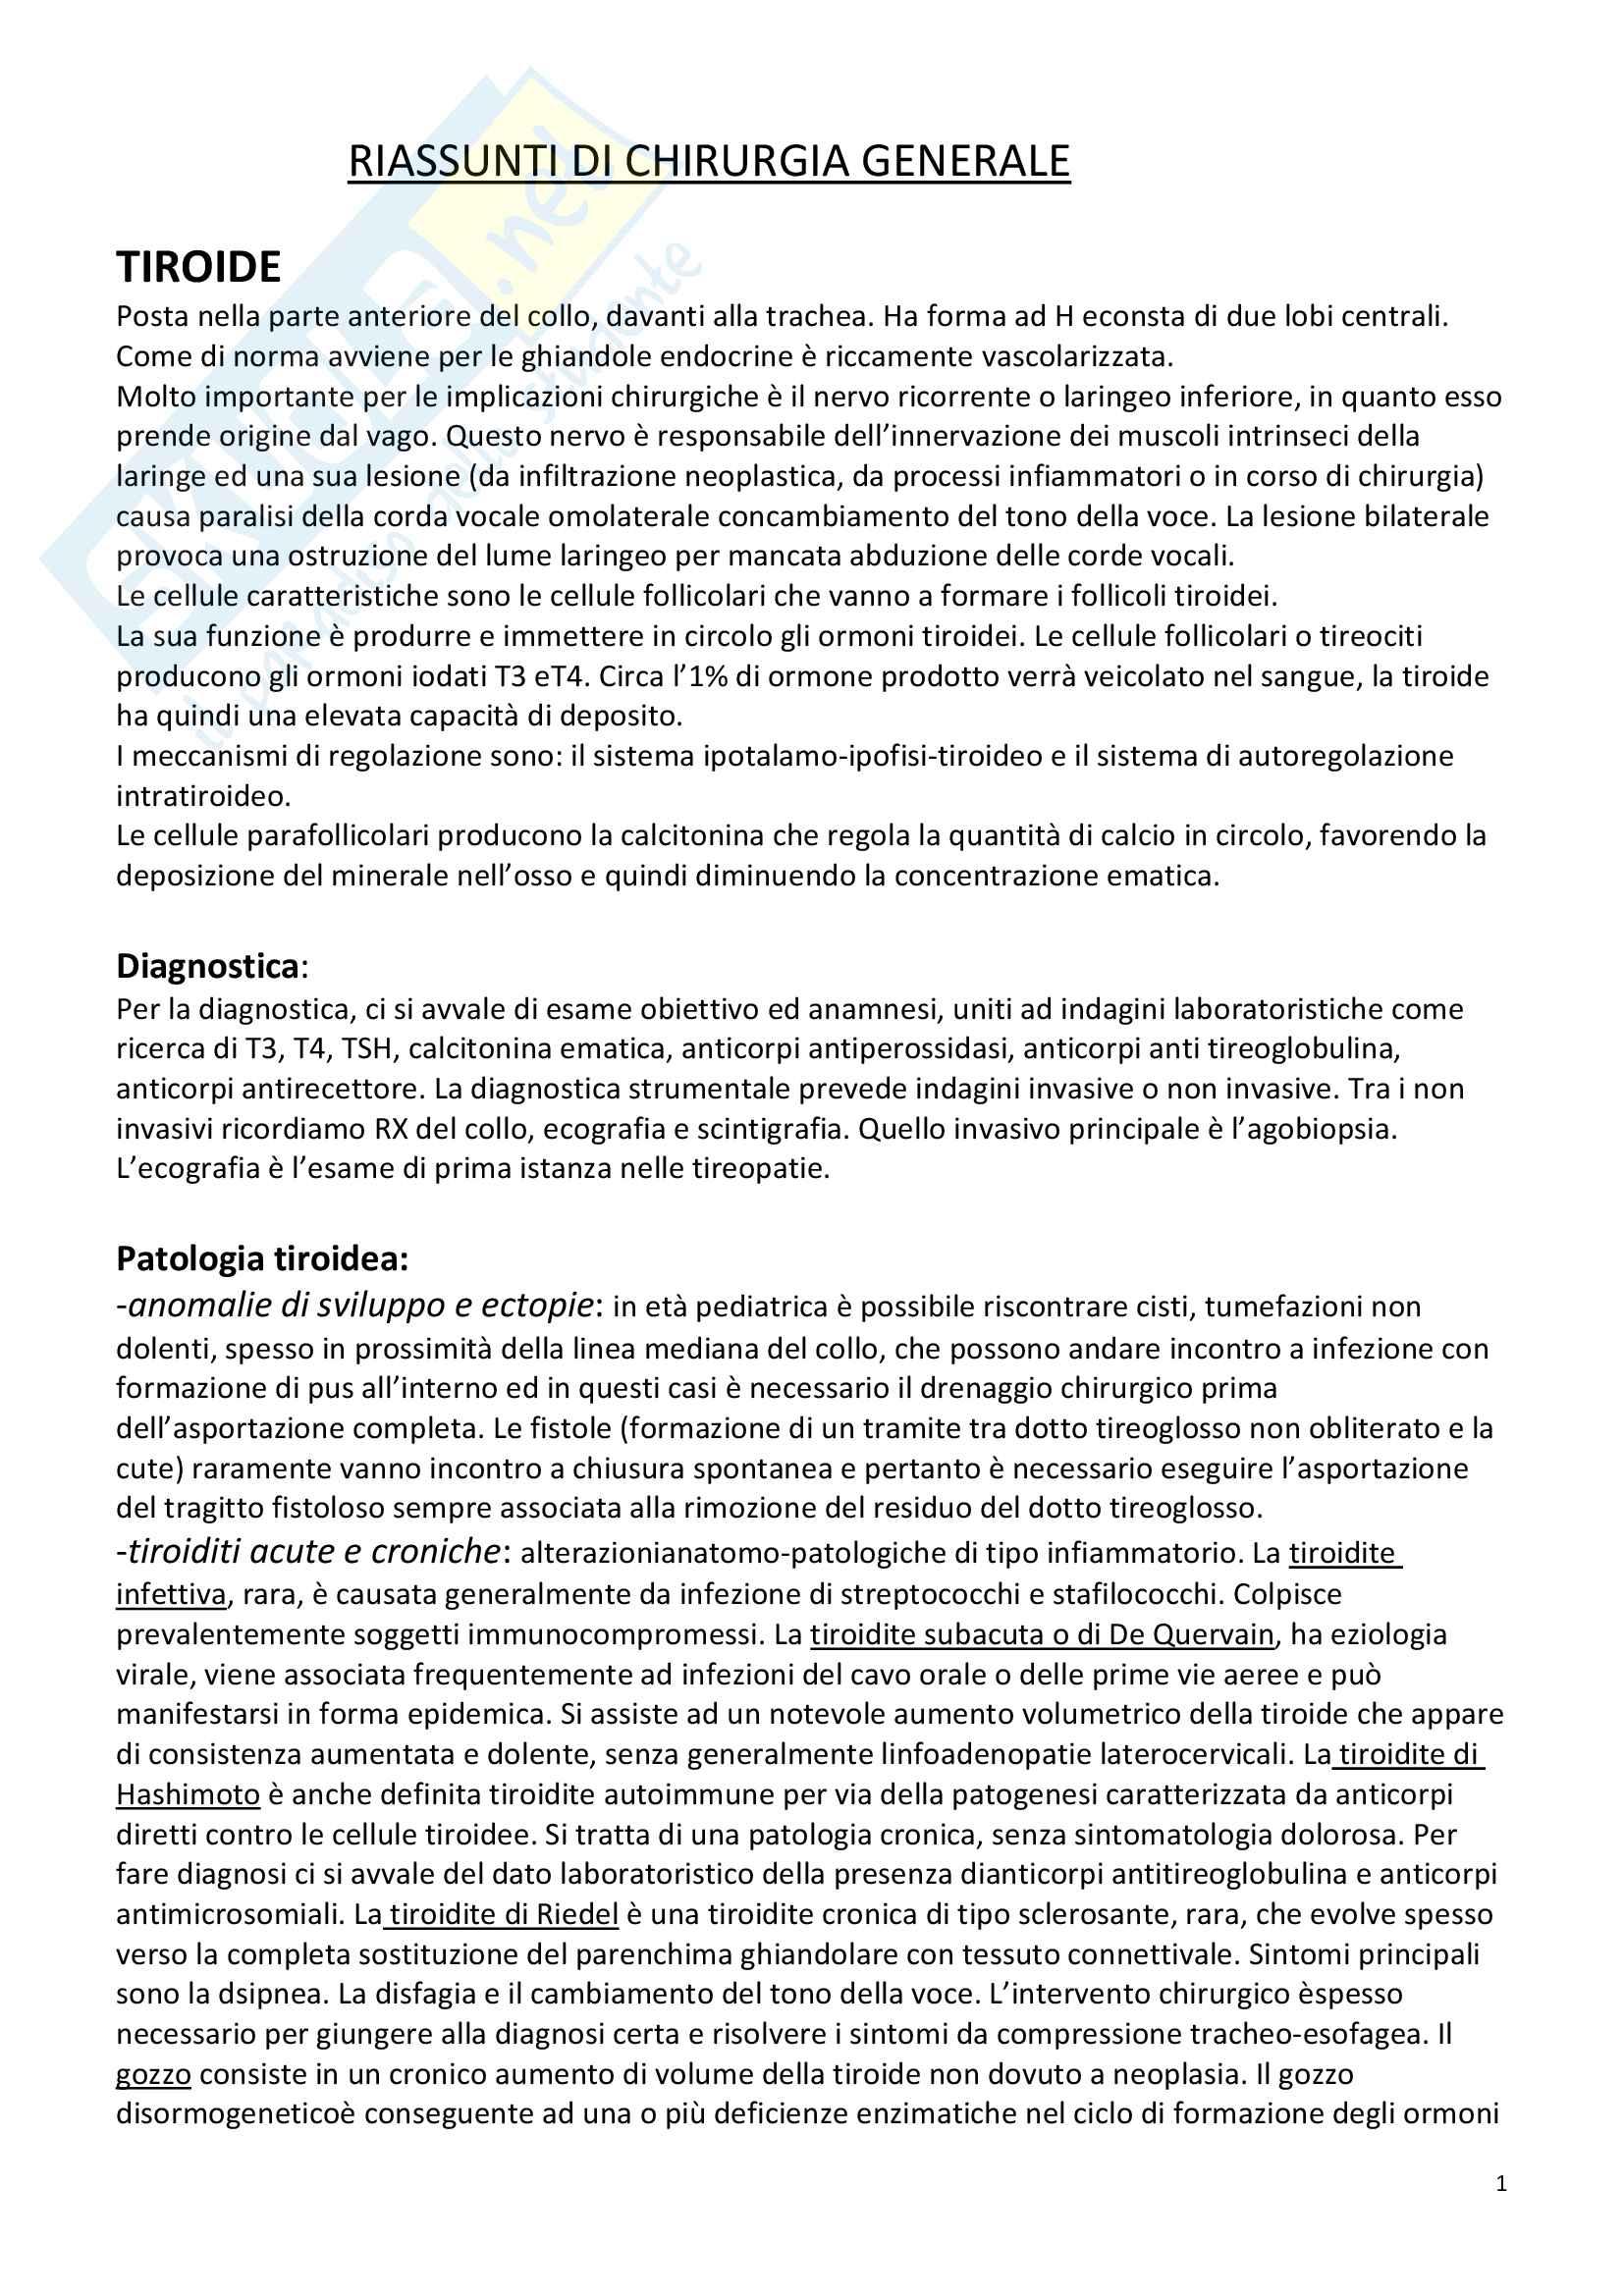 Appunti di Chirurgia Generale